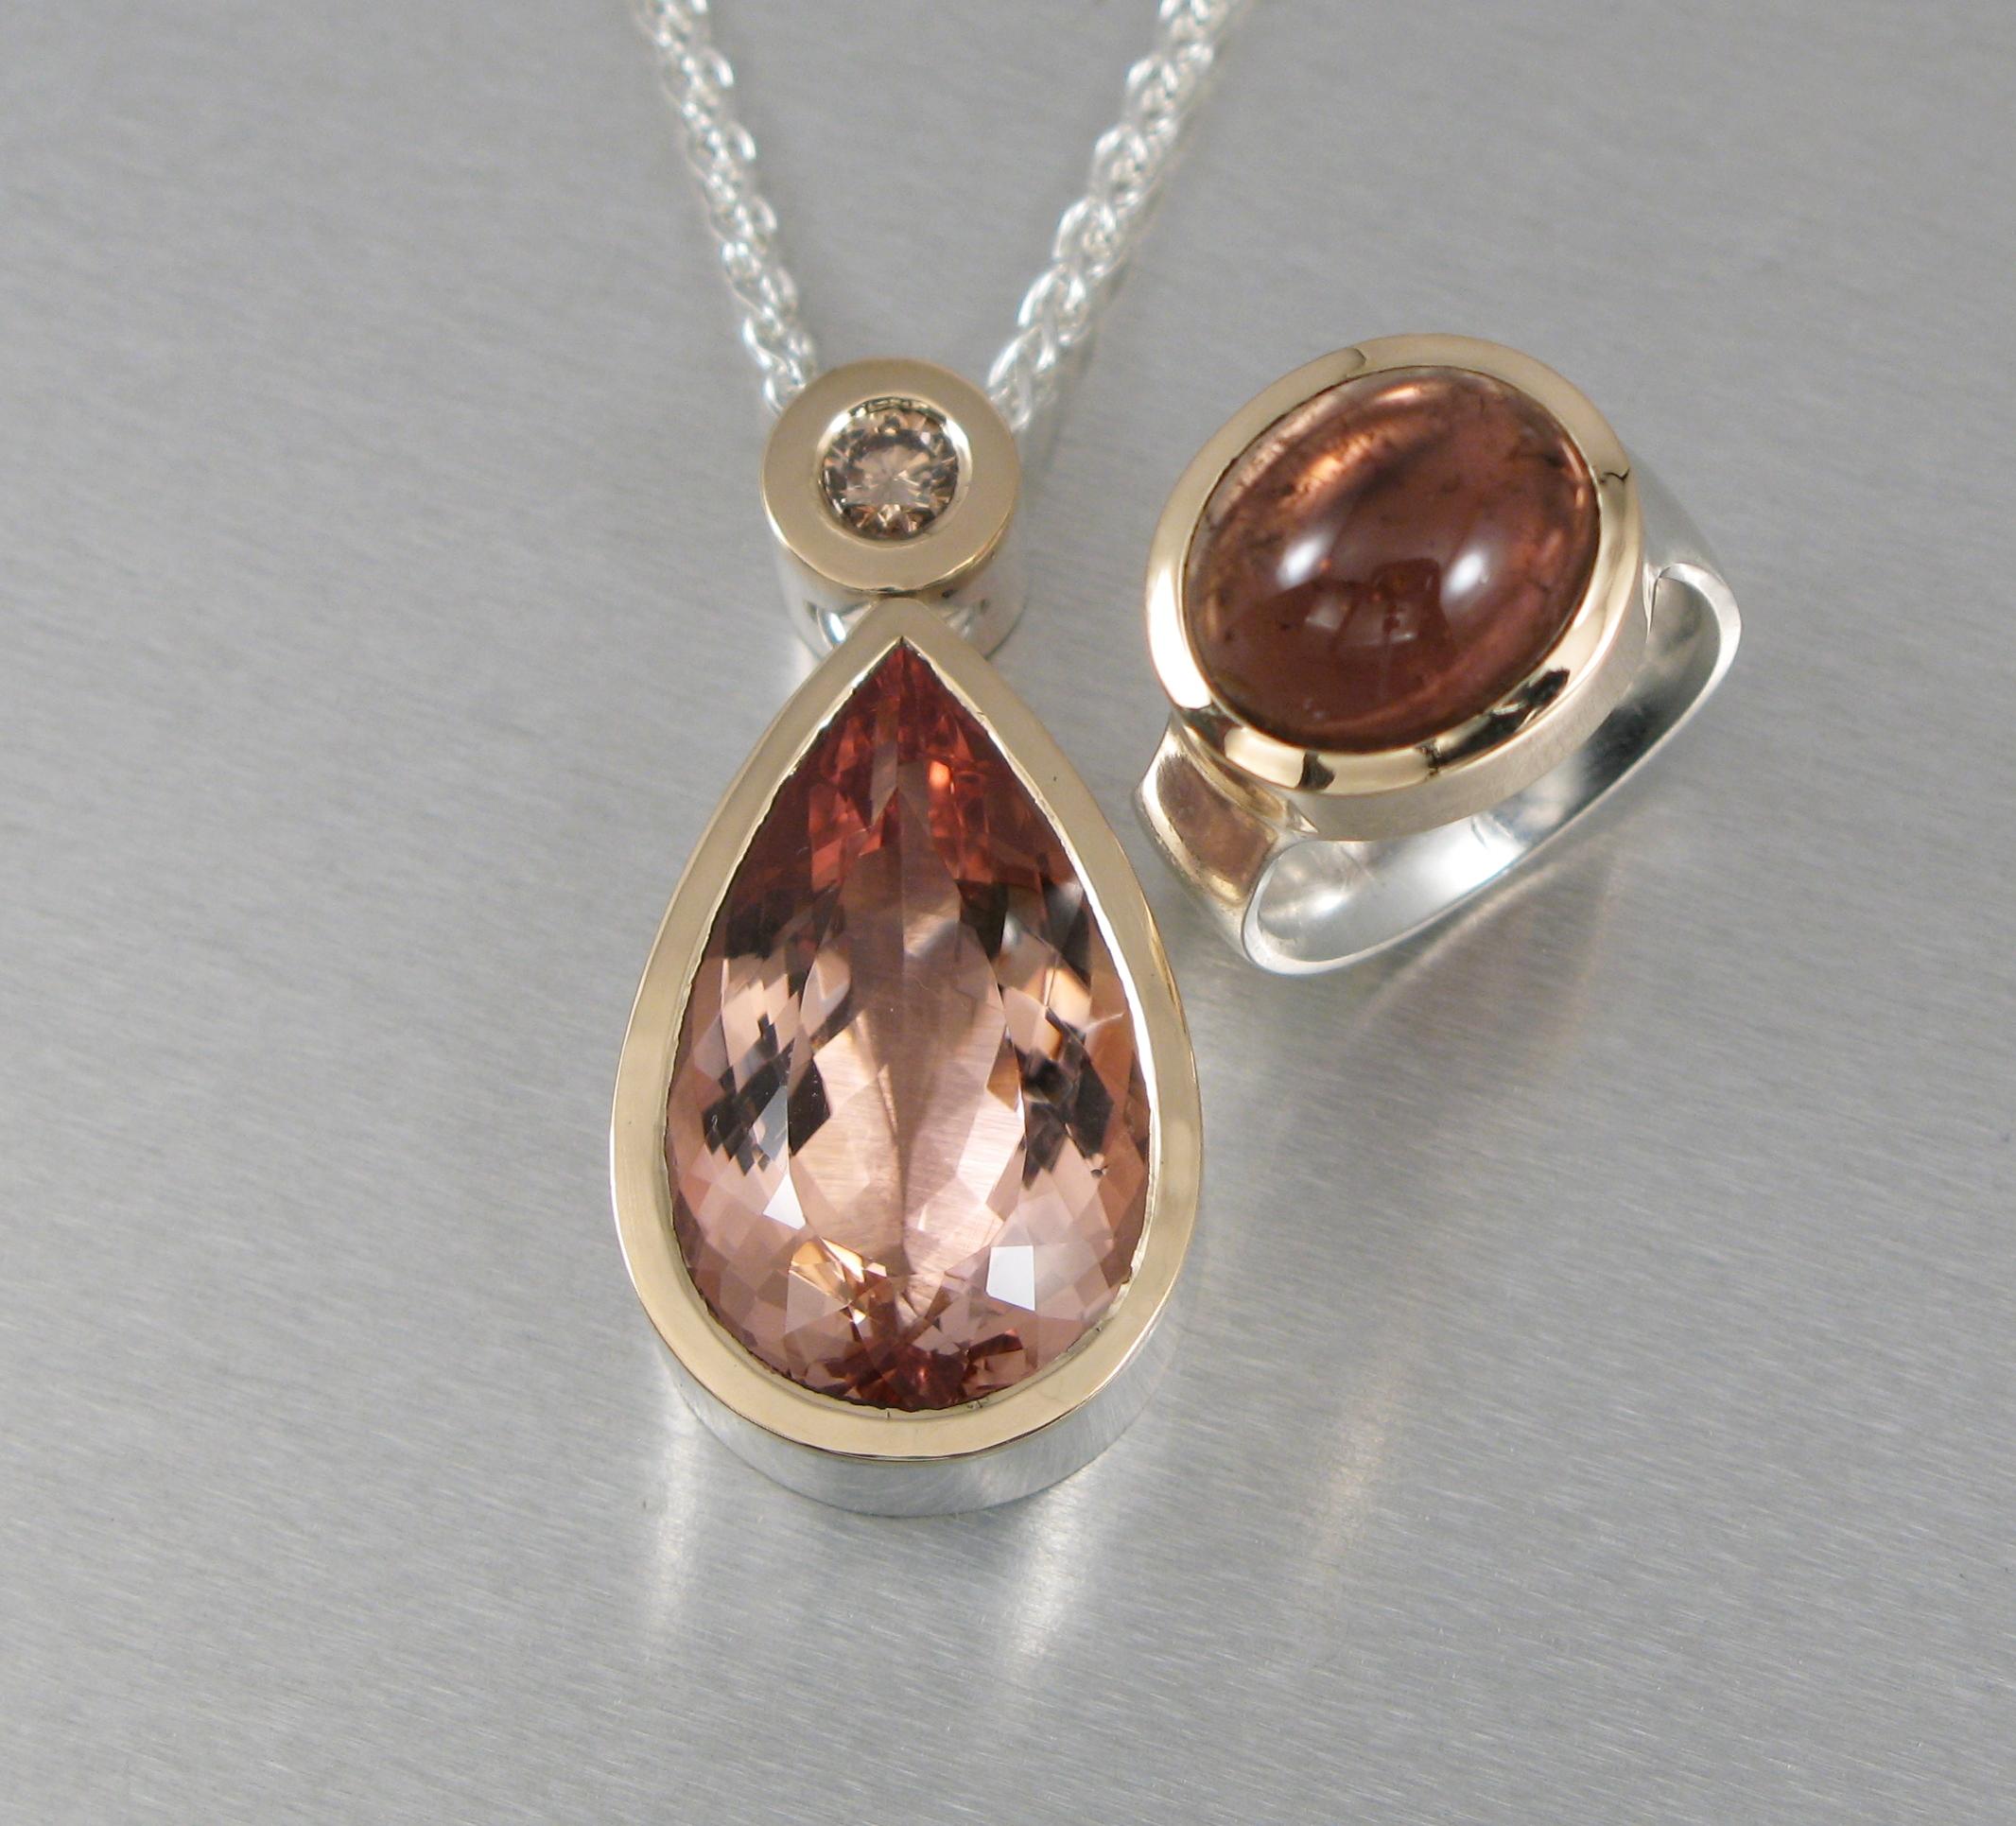 Hänge, silver, guld, morganit, brun diamant